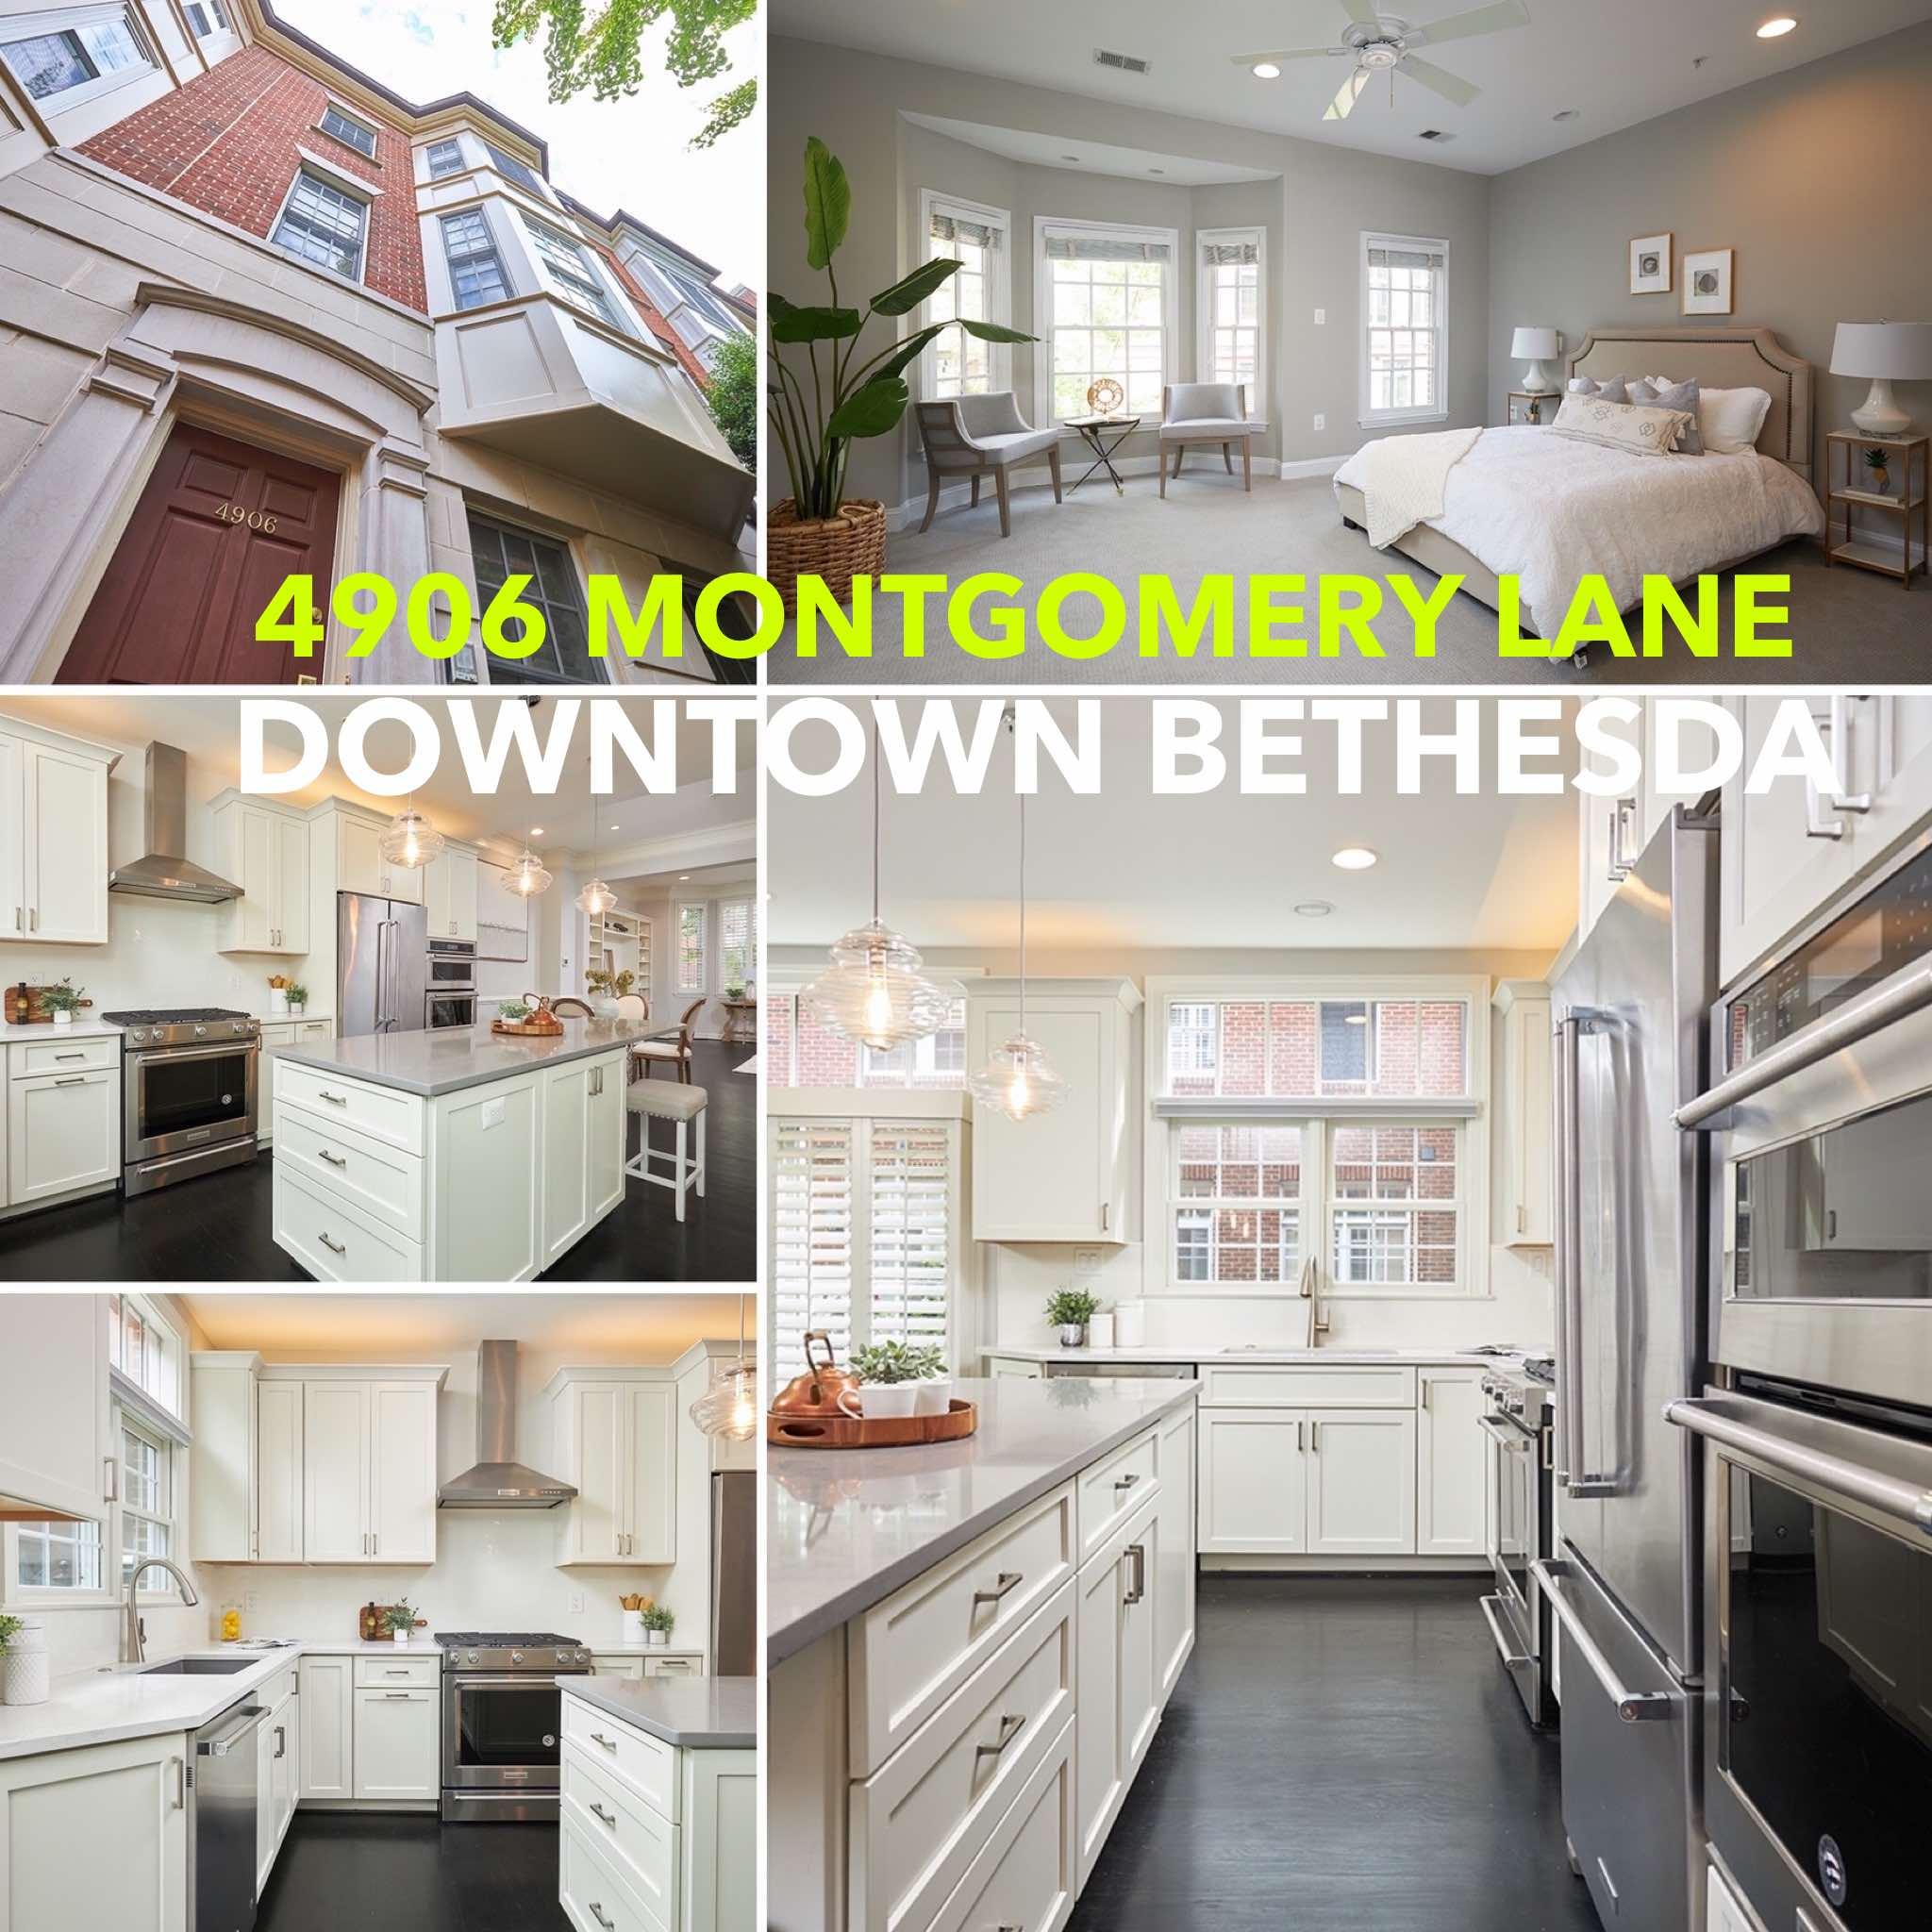 4906 Montgomery Lane Townhome - Downtown Bethesda